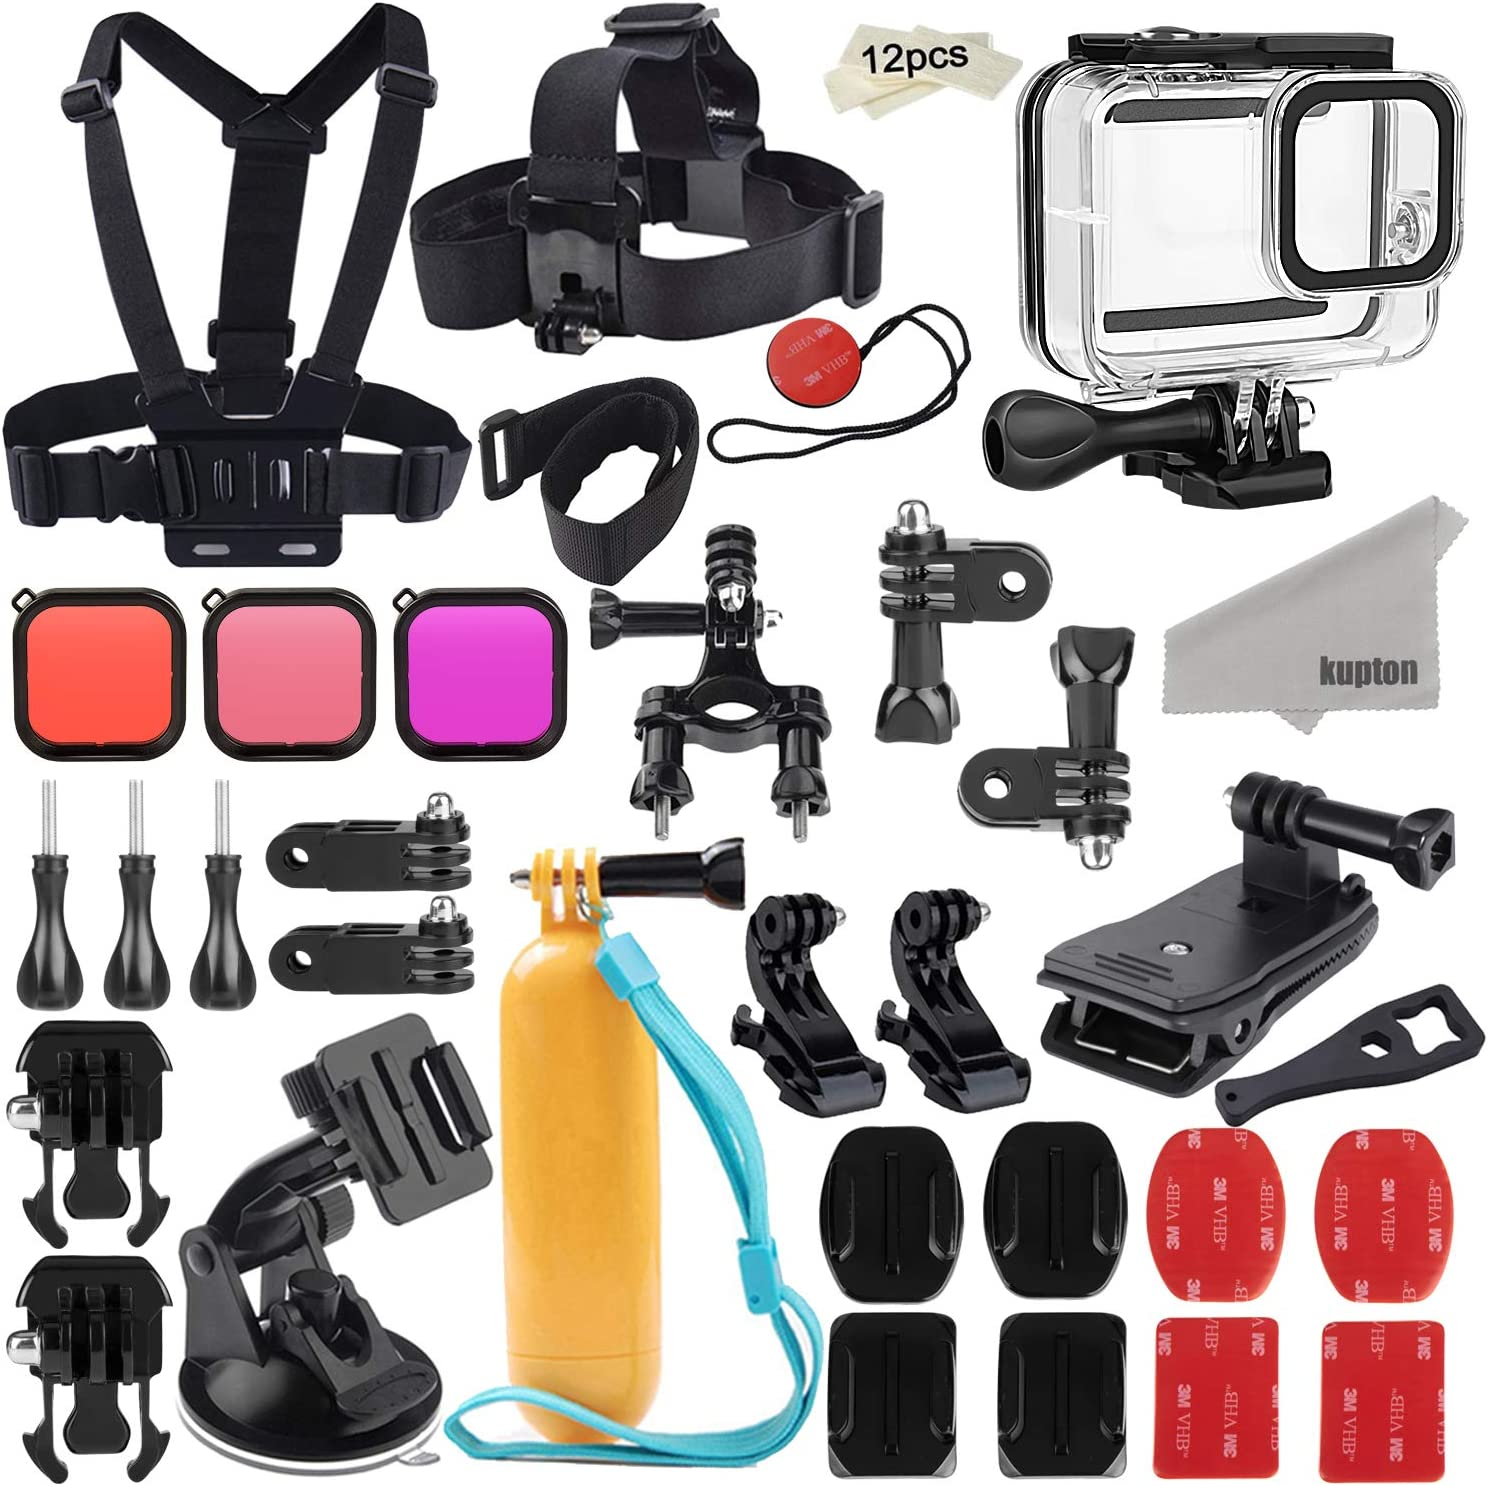 Kupton Zubehörset Kompatibel Mit Gopro Hero 8 Kamera